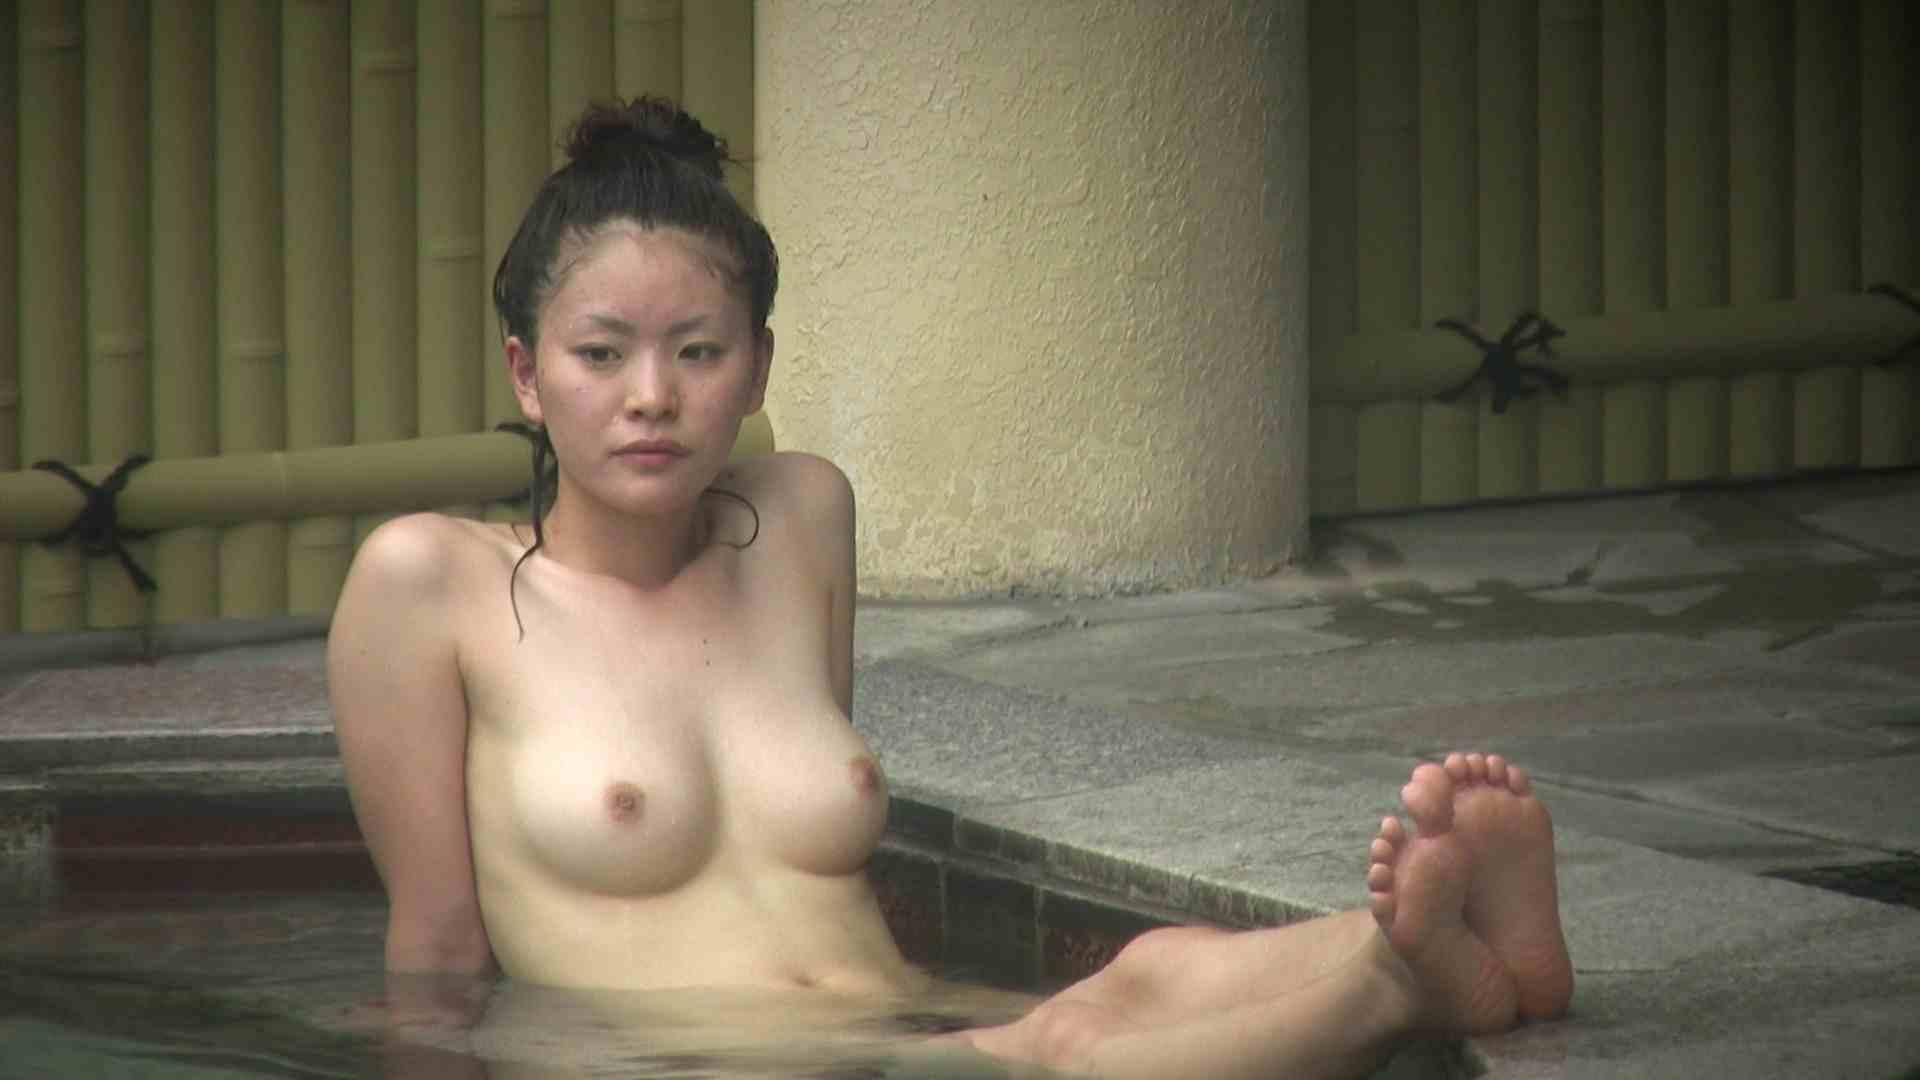 Aquaな露天風呂Vol.137 エッチな盗撮 オメコ無修正動画無料 92pic 83